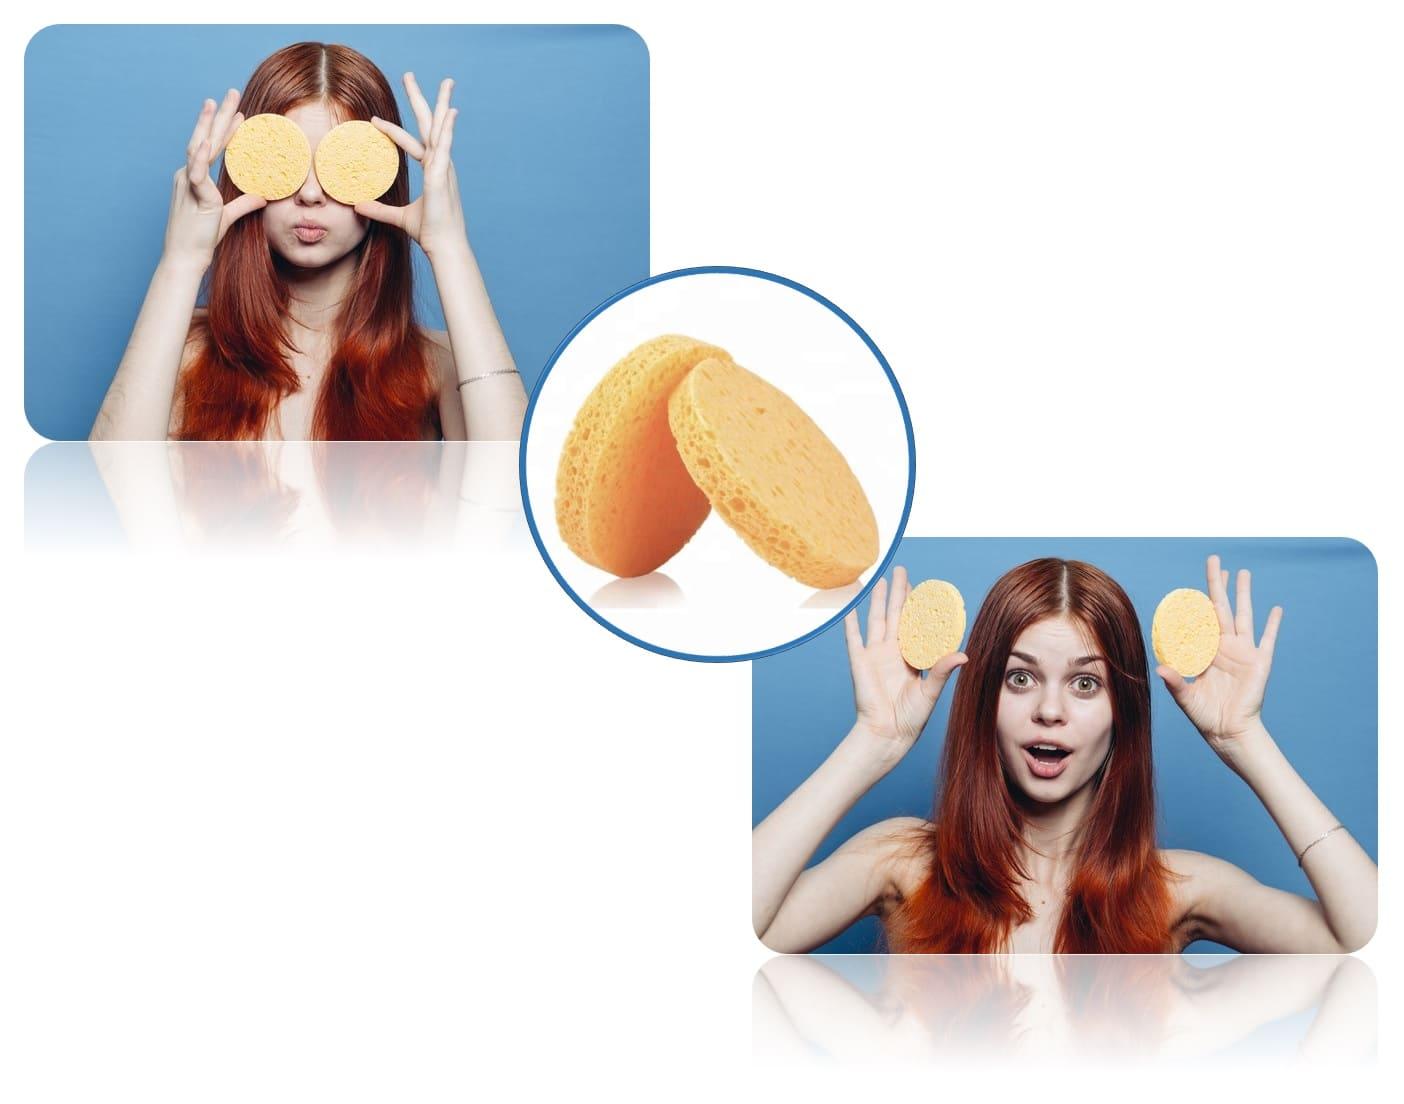 Esponjas exfoliantes faciales redondas amarillas comprar set pack kit 2